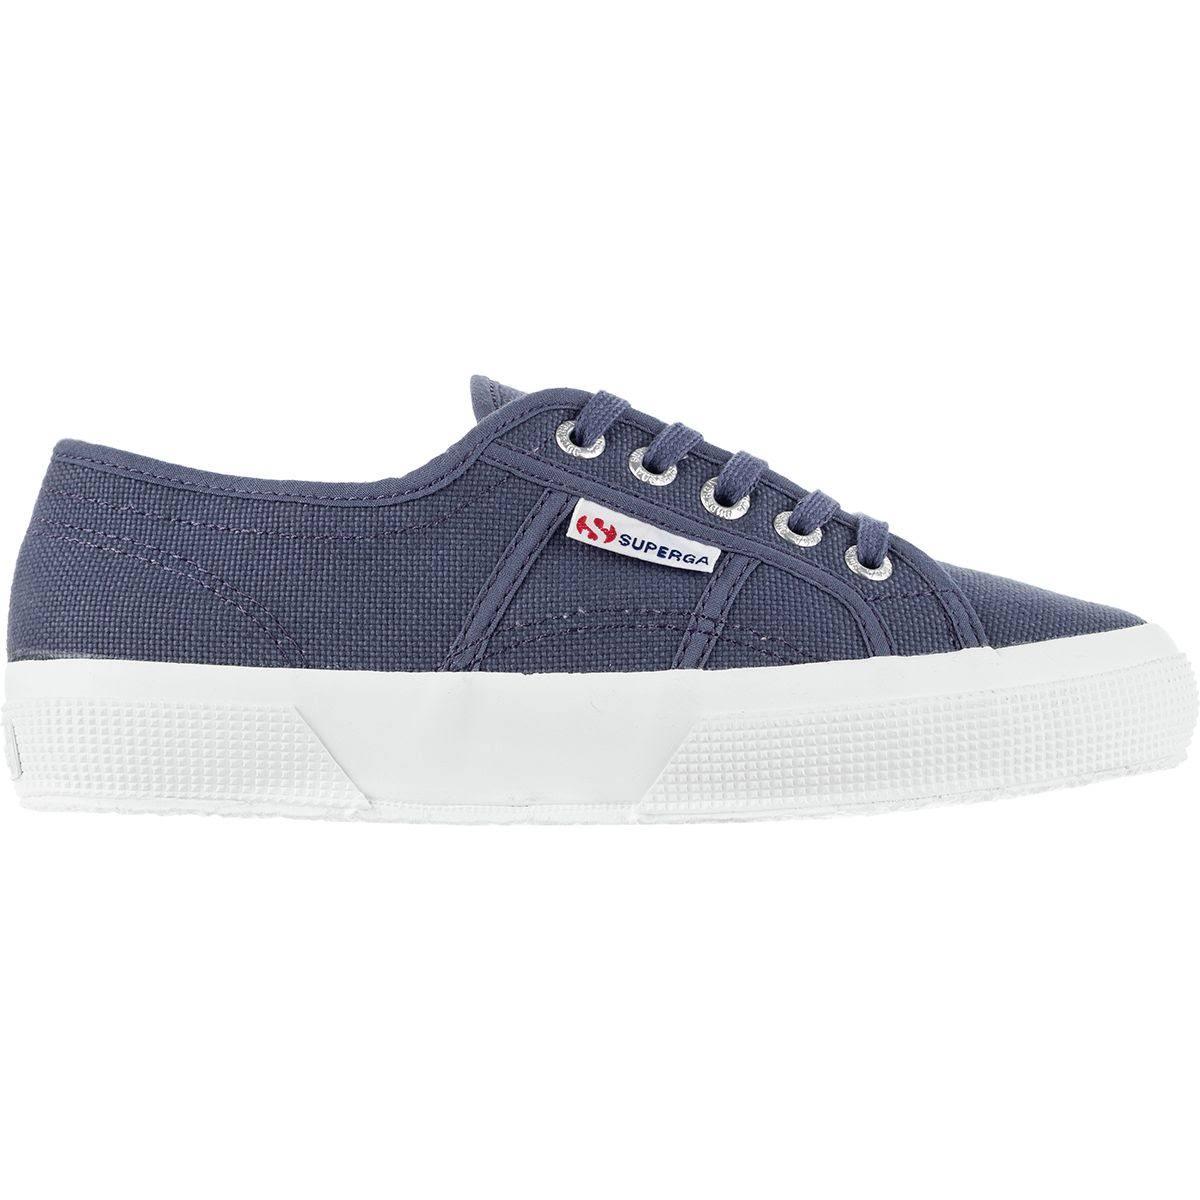 Azul 0 Cotu Sombra Clásico 2750 Superga Zapato Mujer 9 Para Blanco qXvw1PnFW